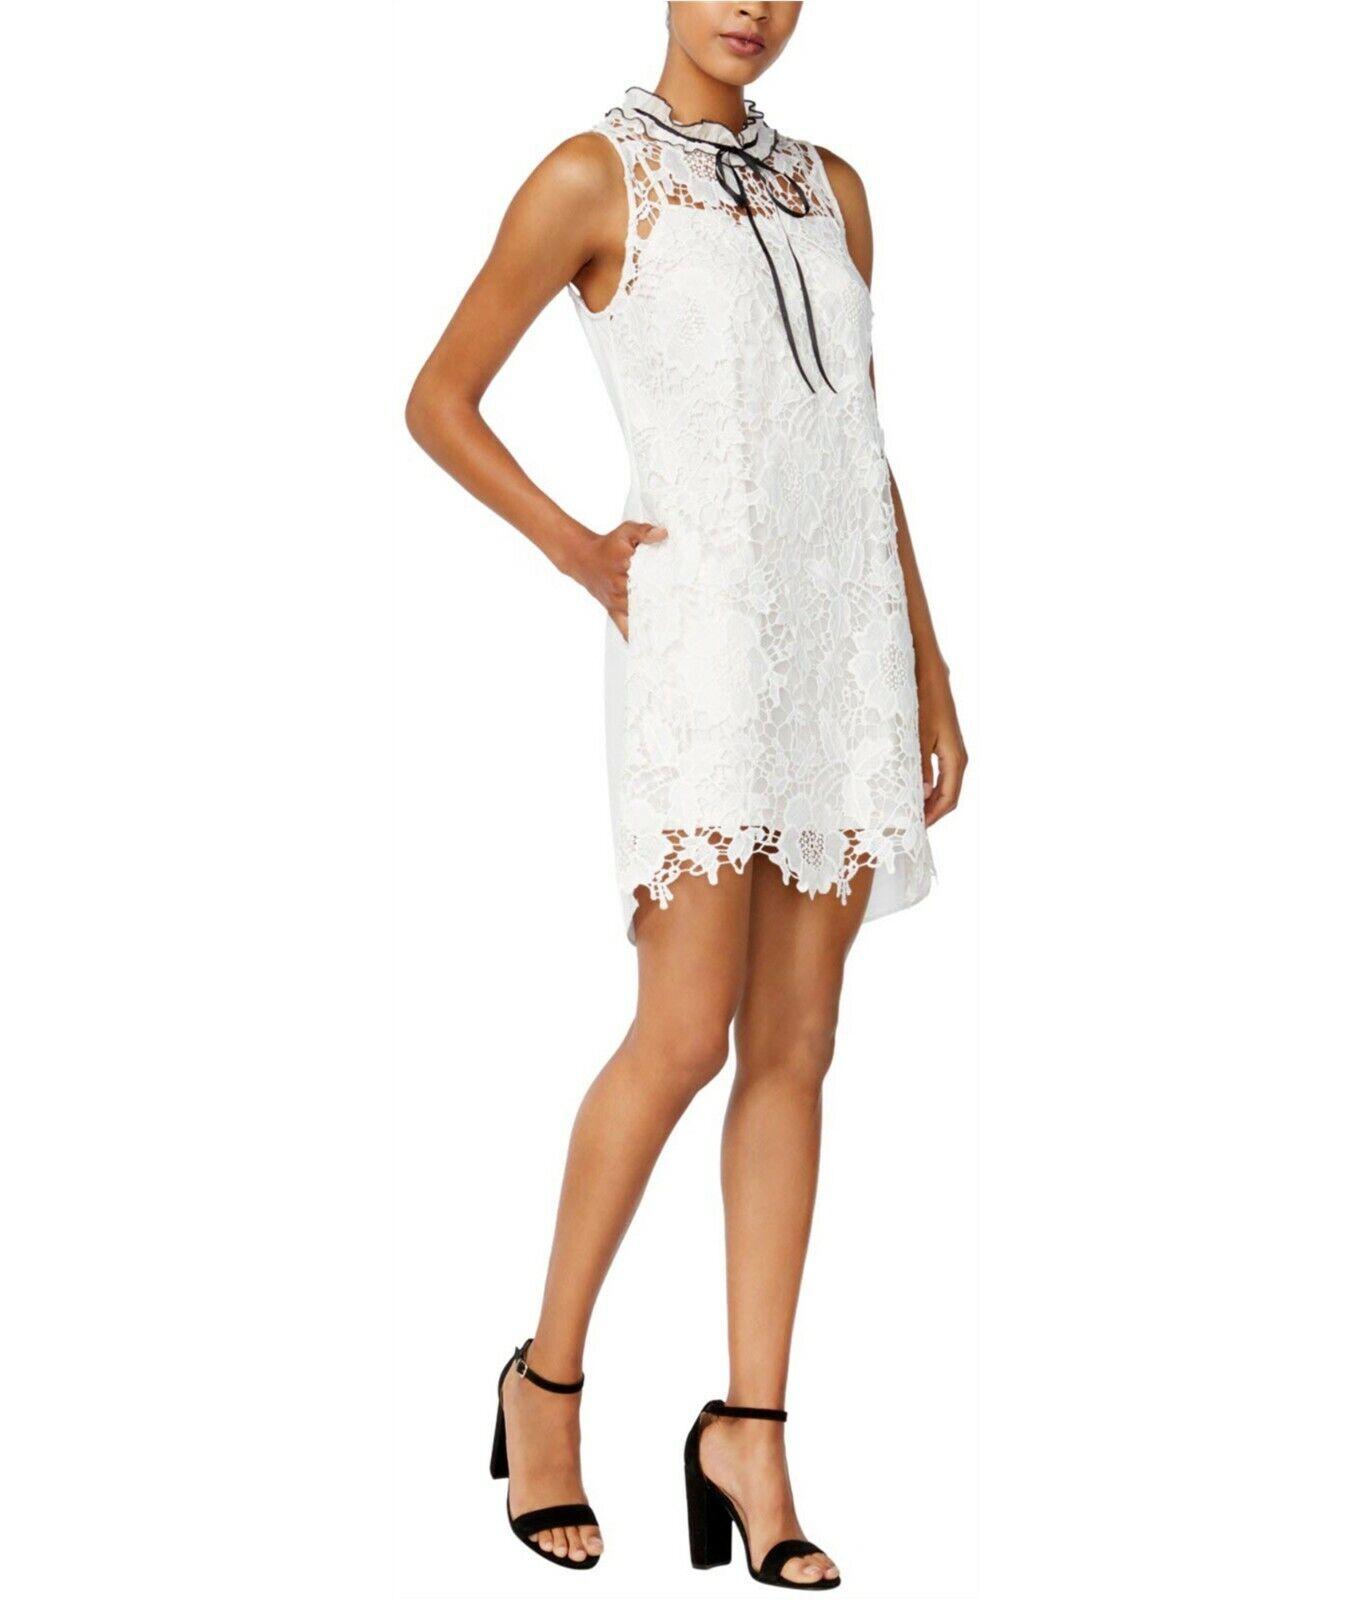 Kensie Woherren Lace Shift High Neck Mini Dress Cream Größe X-Small